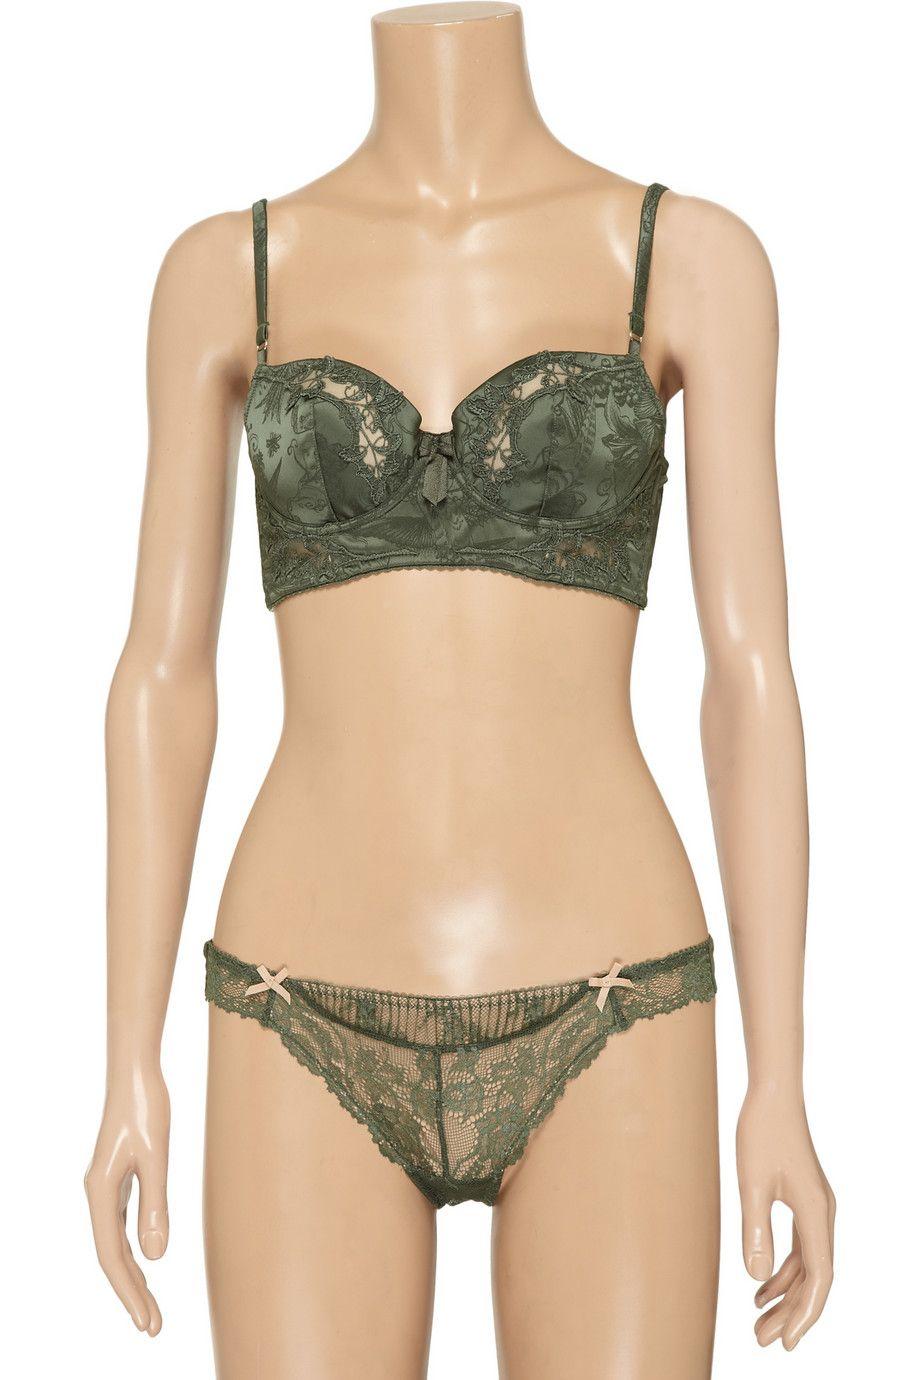 Elle Macpherson Intimates Exotic Garden contour bra - 50% Off Now at THE OUTNET